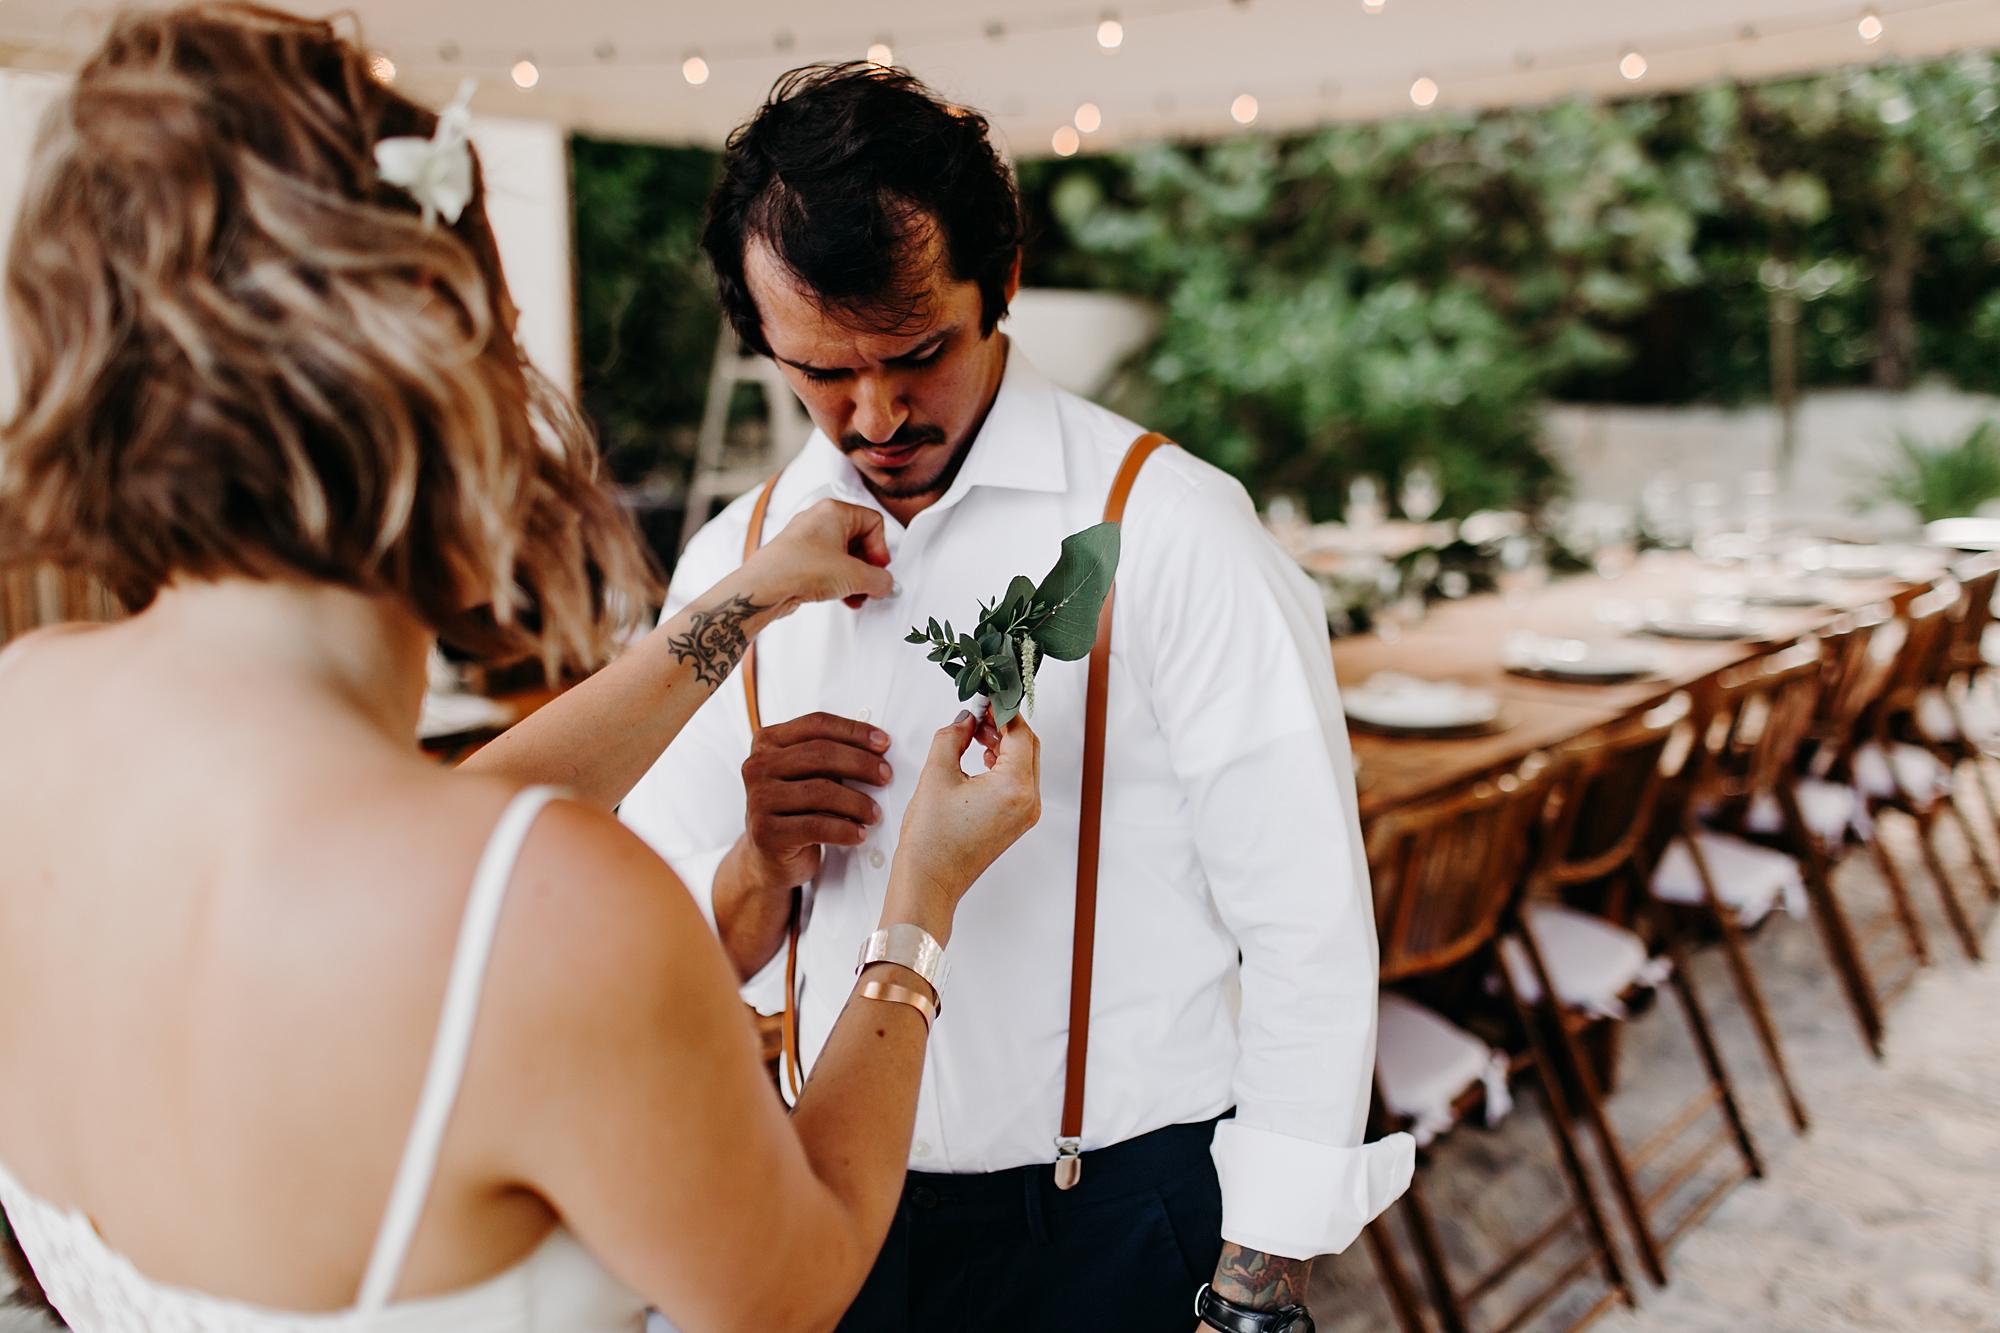 Danielle-San-Antonio-Wedding-Photographer-94_WEB.jpg